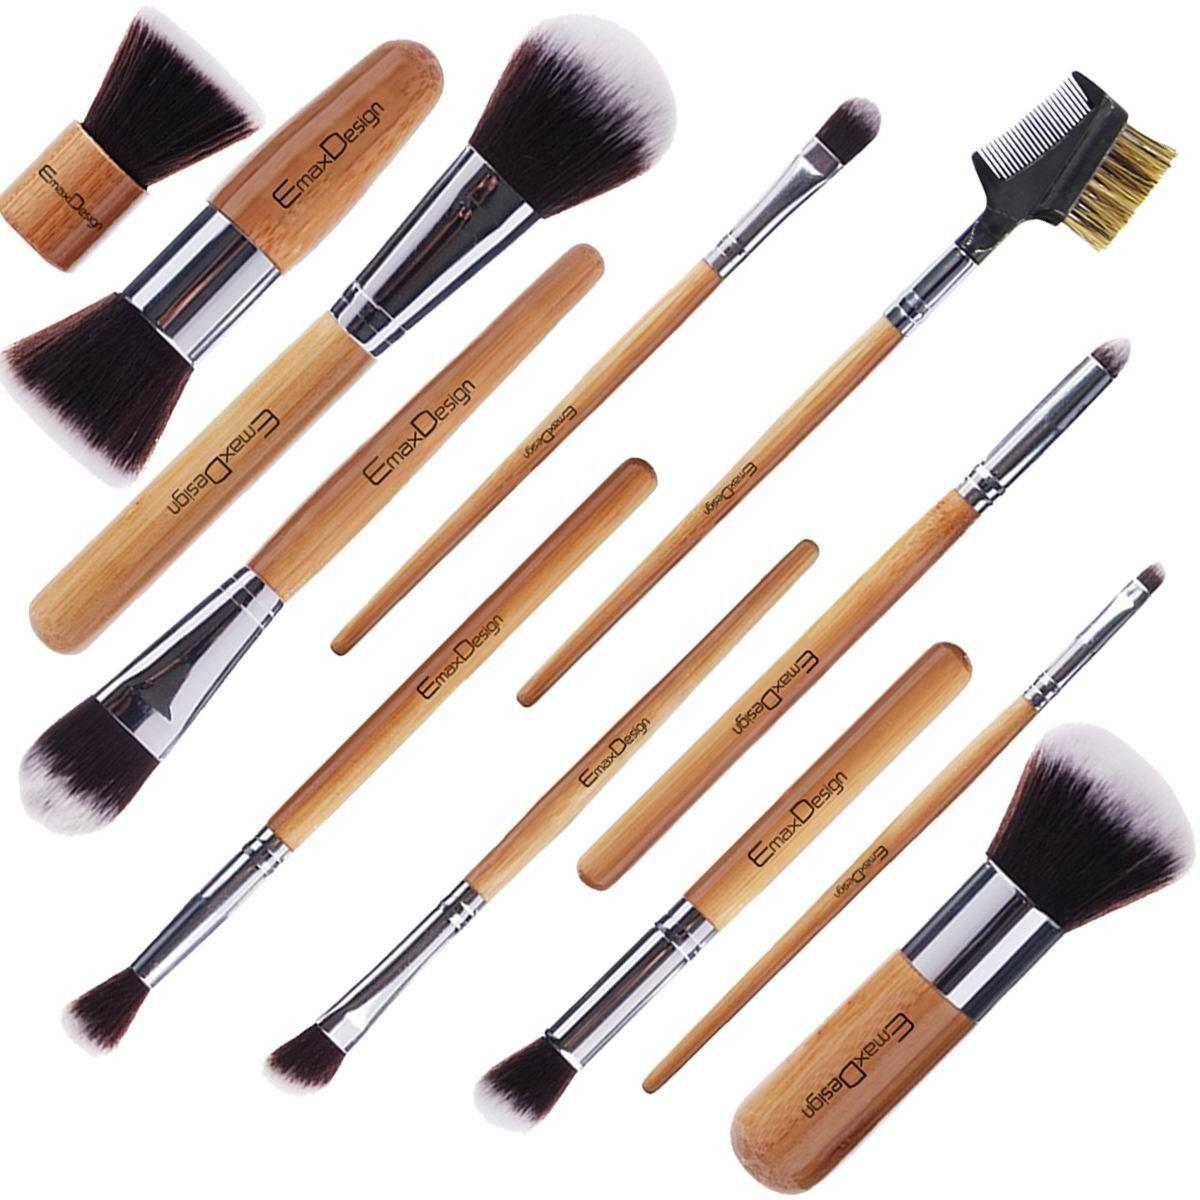 MakeupBrushSetEmaxDesign12pcProfessionalBAMBOO